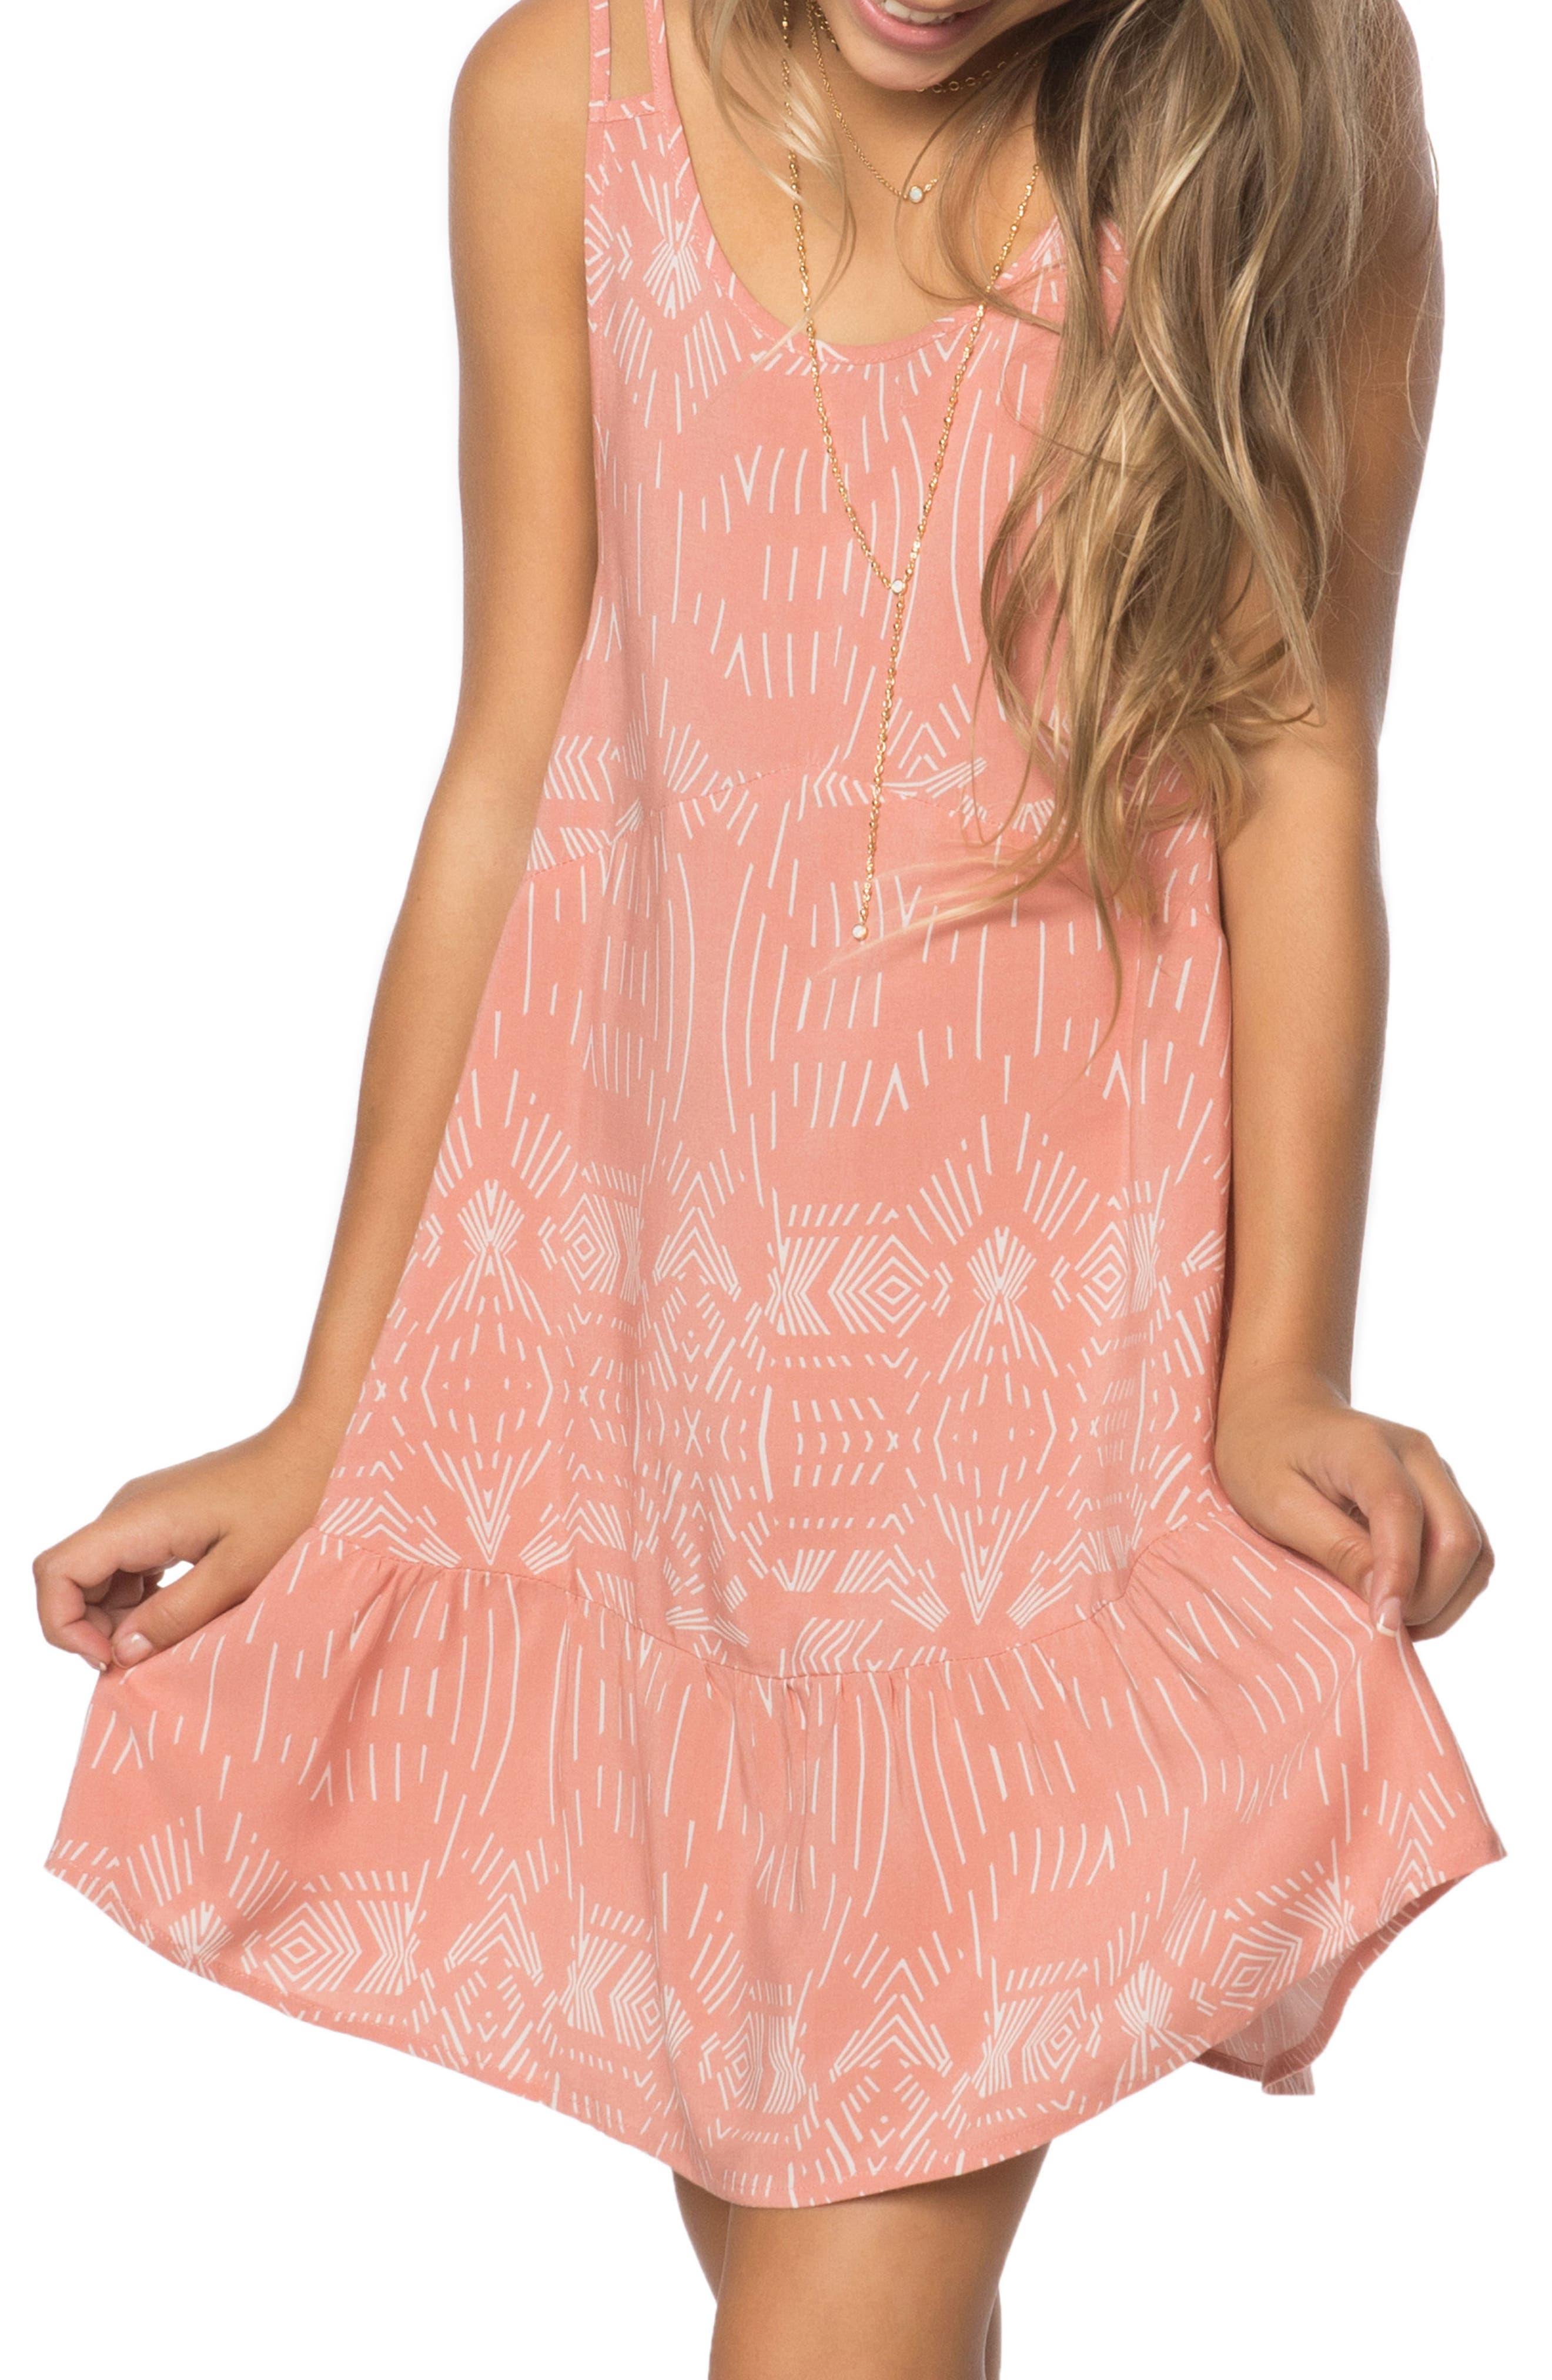 Alternate Image 1 Selected - O'Neilll Harley Sleeveless Dress (Big Girls)